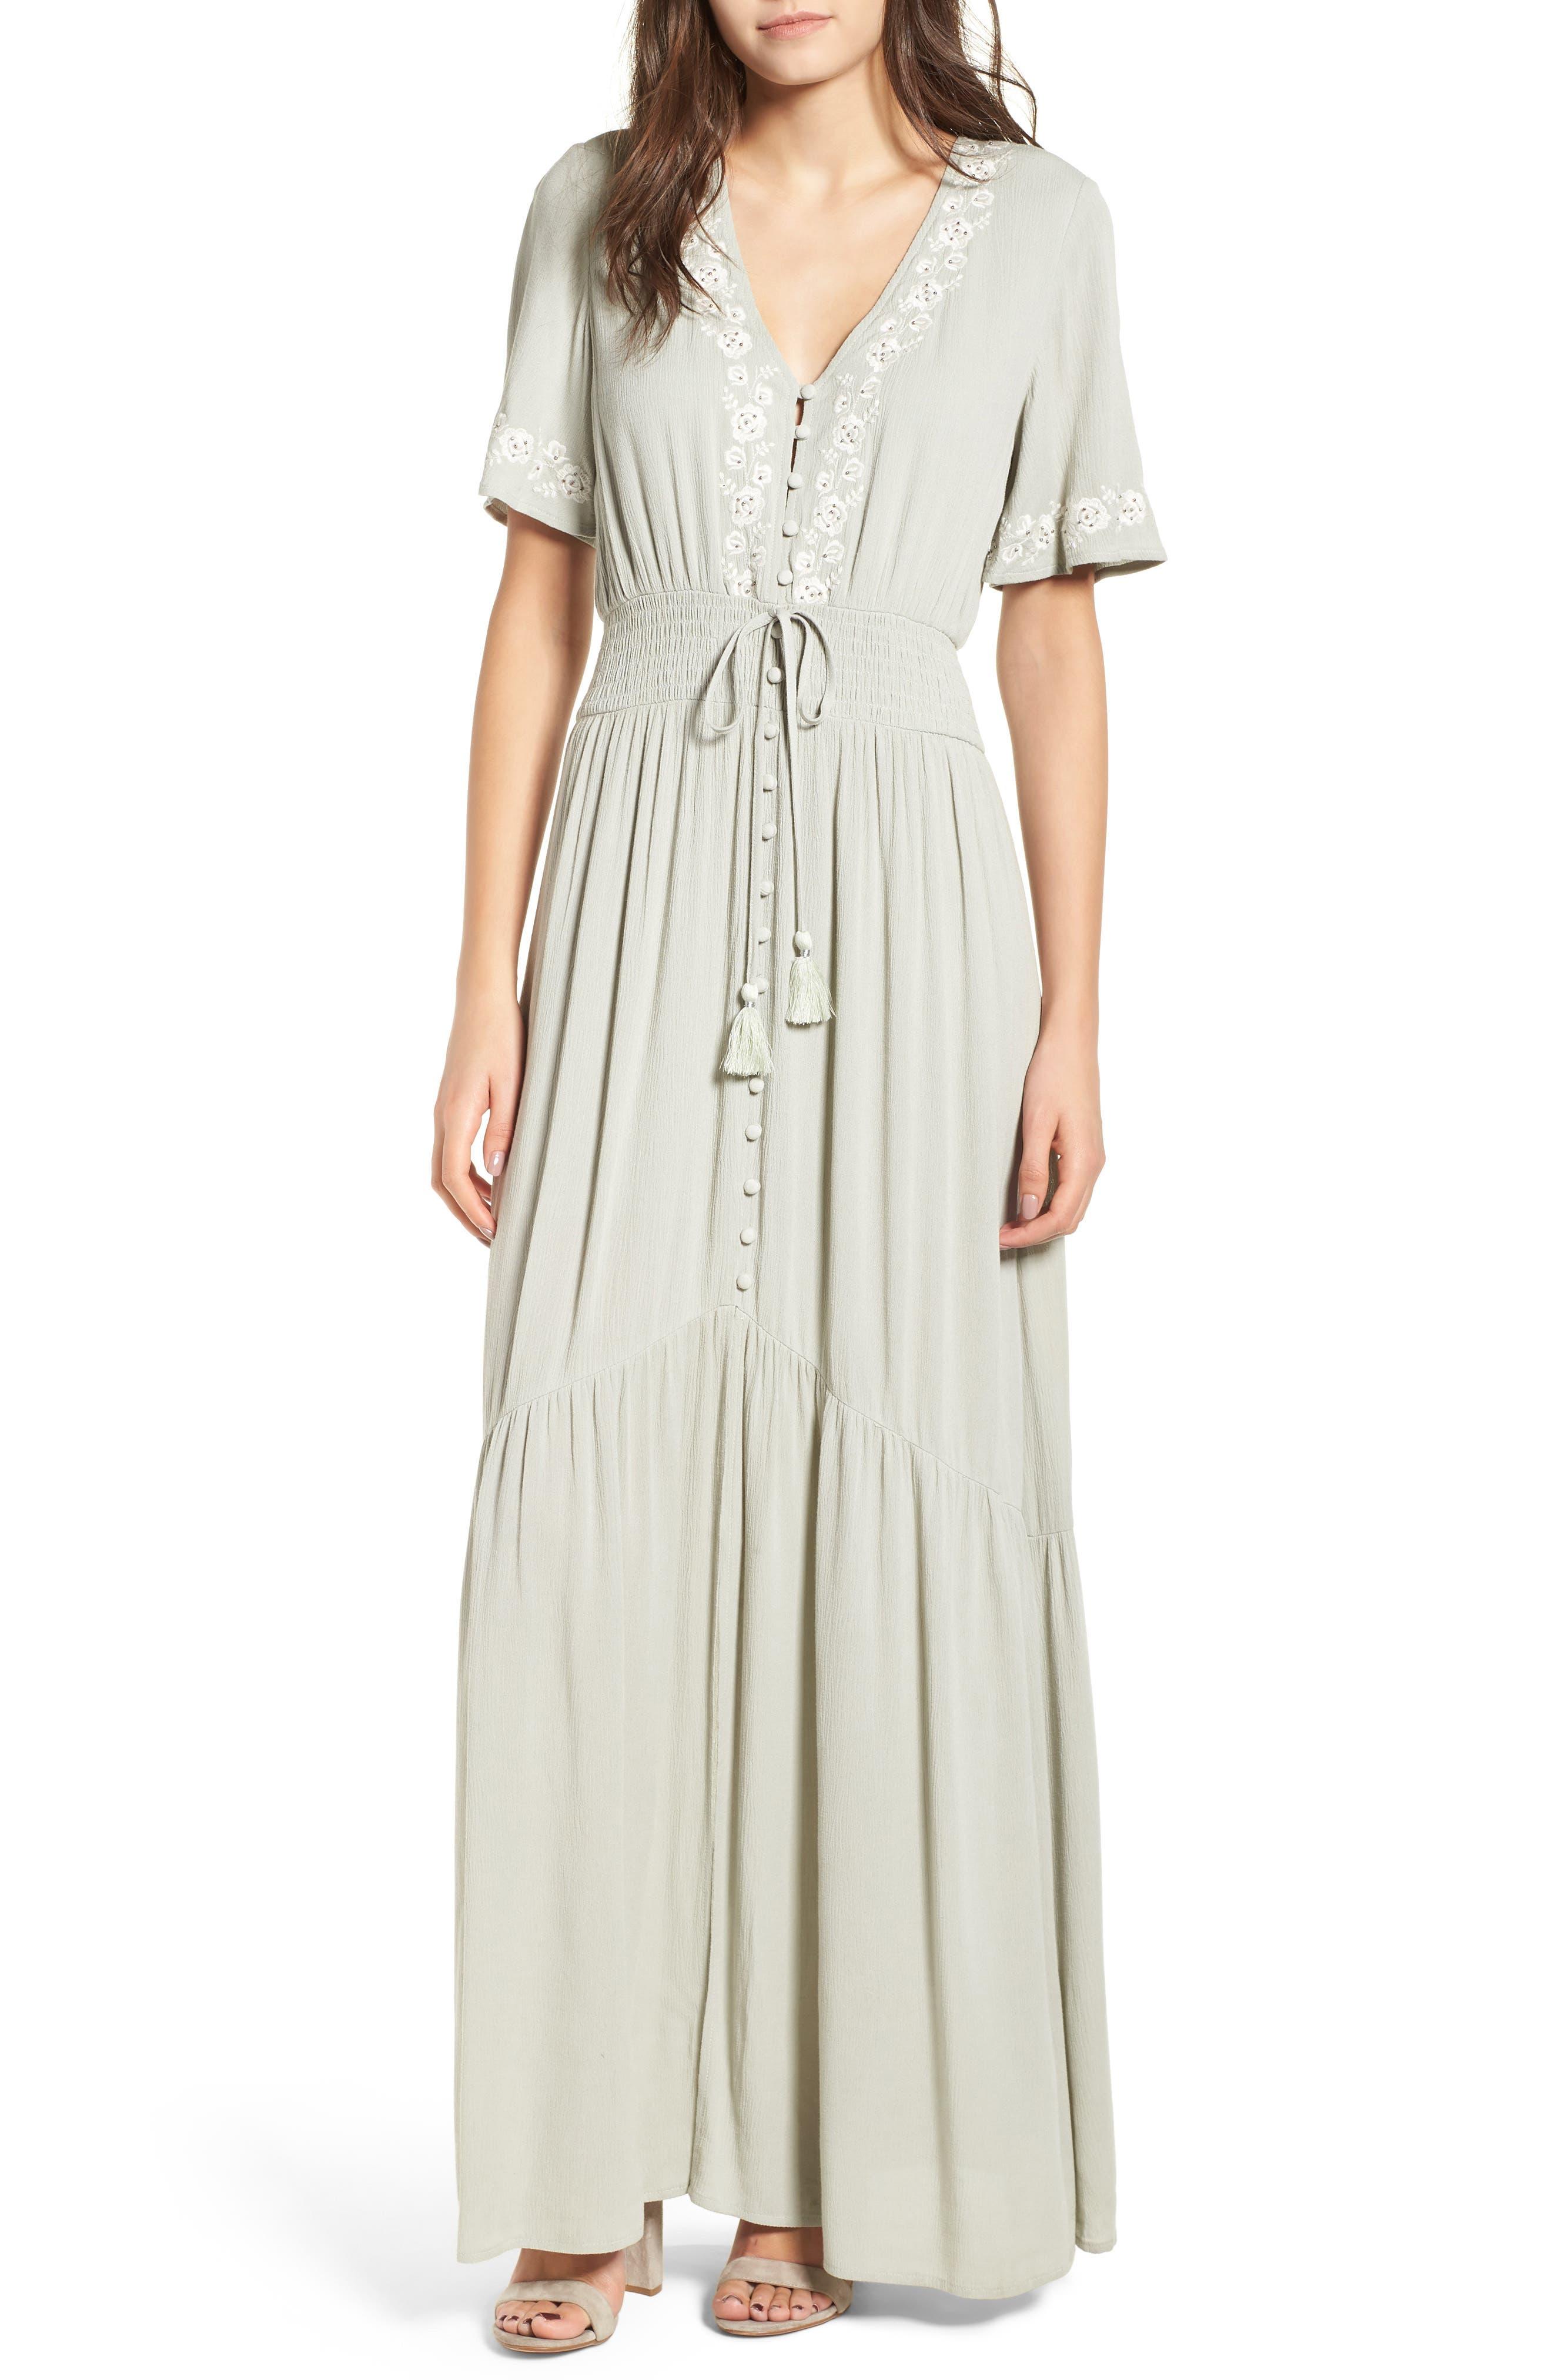 Athena Embroidered Maxi Dress,                             Main thumbnail 1, color,                             Sage